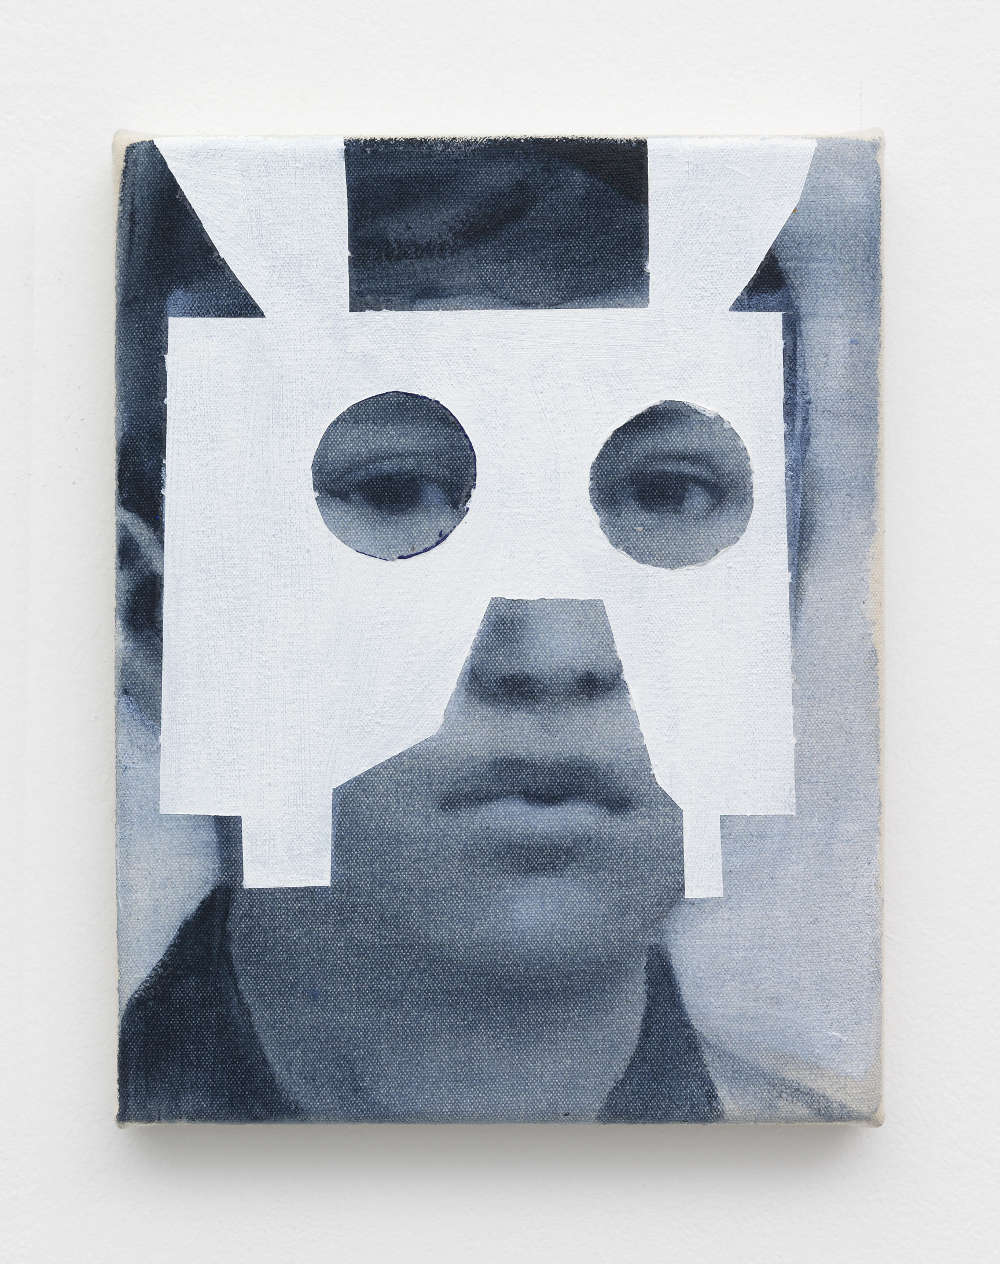 Giulia Andreani, Bambino, 2018. Acrylic on canvas 24 x 19 cm (9.45 x 7.48 inches)